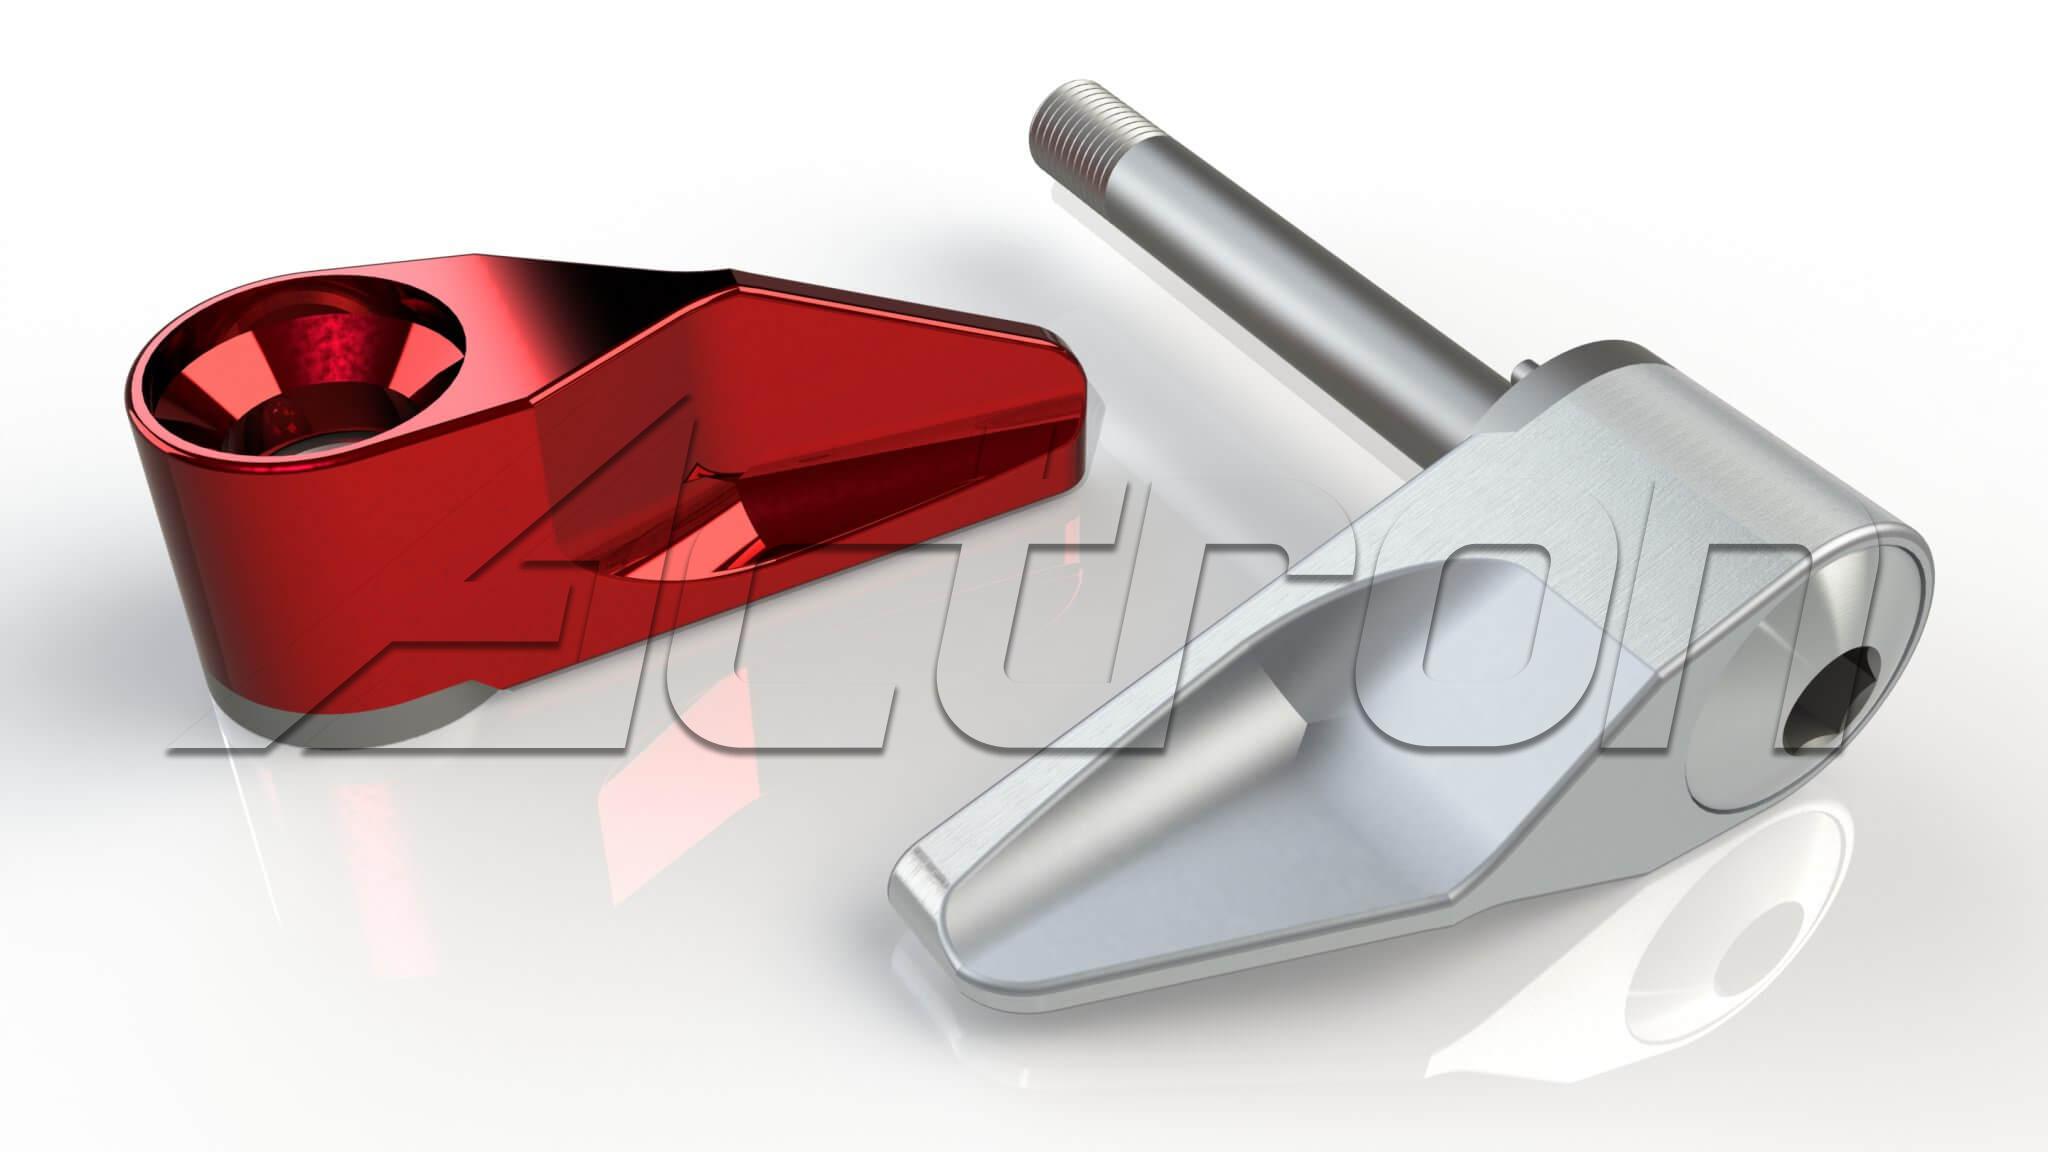 1-4-turn-retainer-4643-a35648.jpg